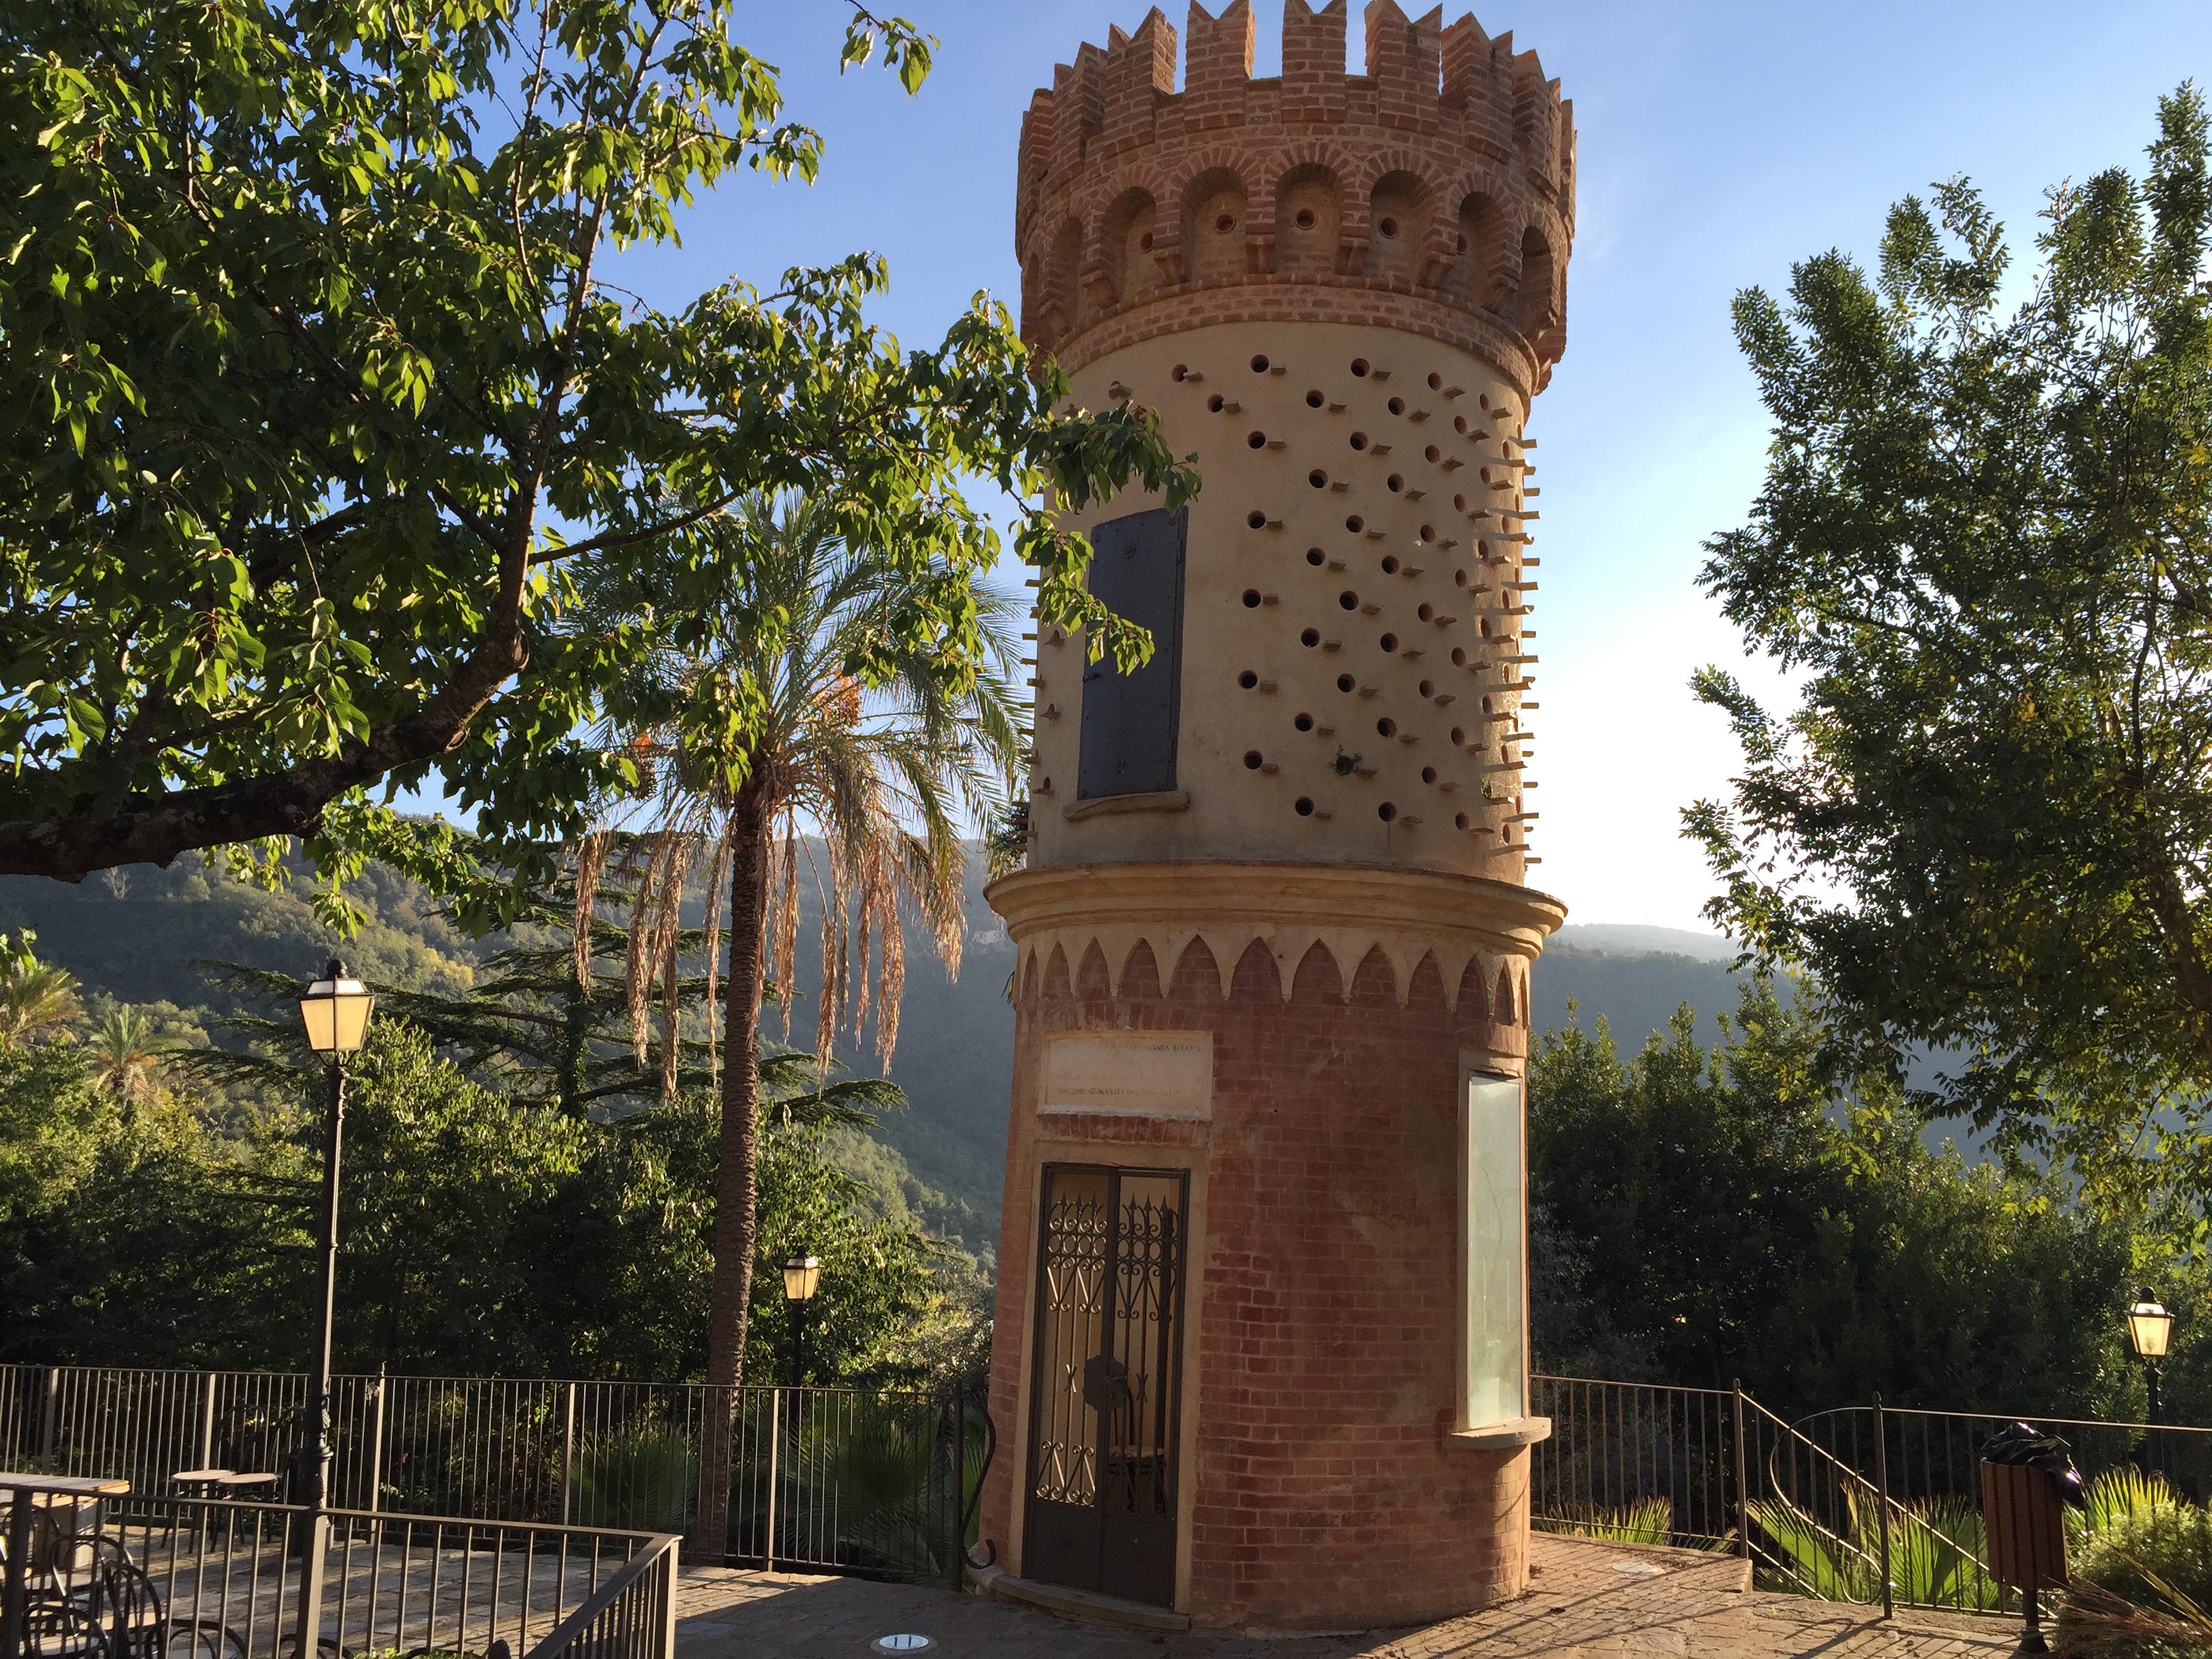 Torchiara Torre Colombaia